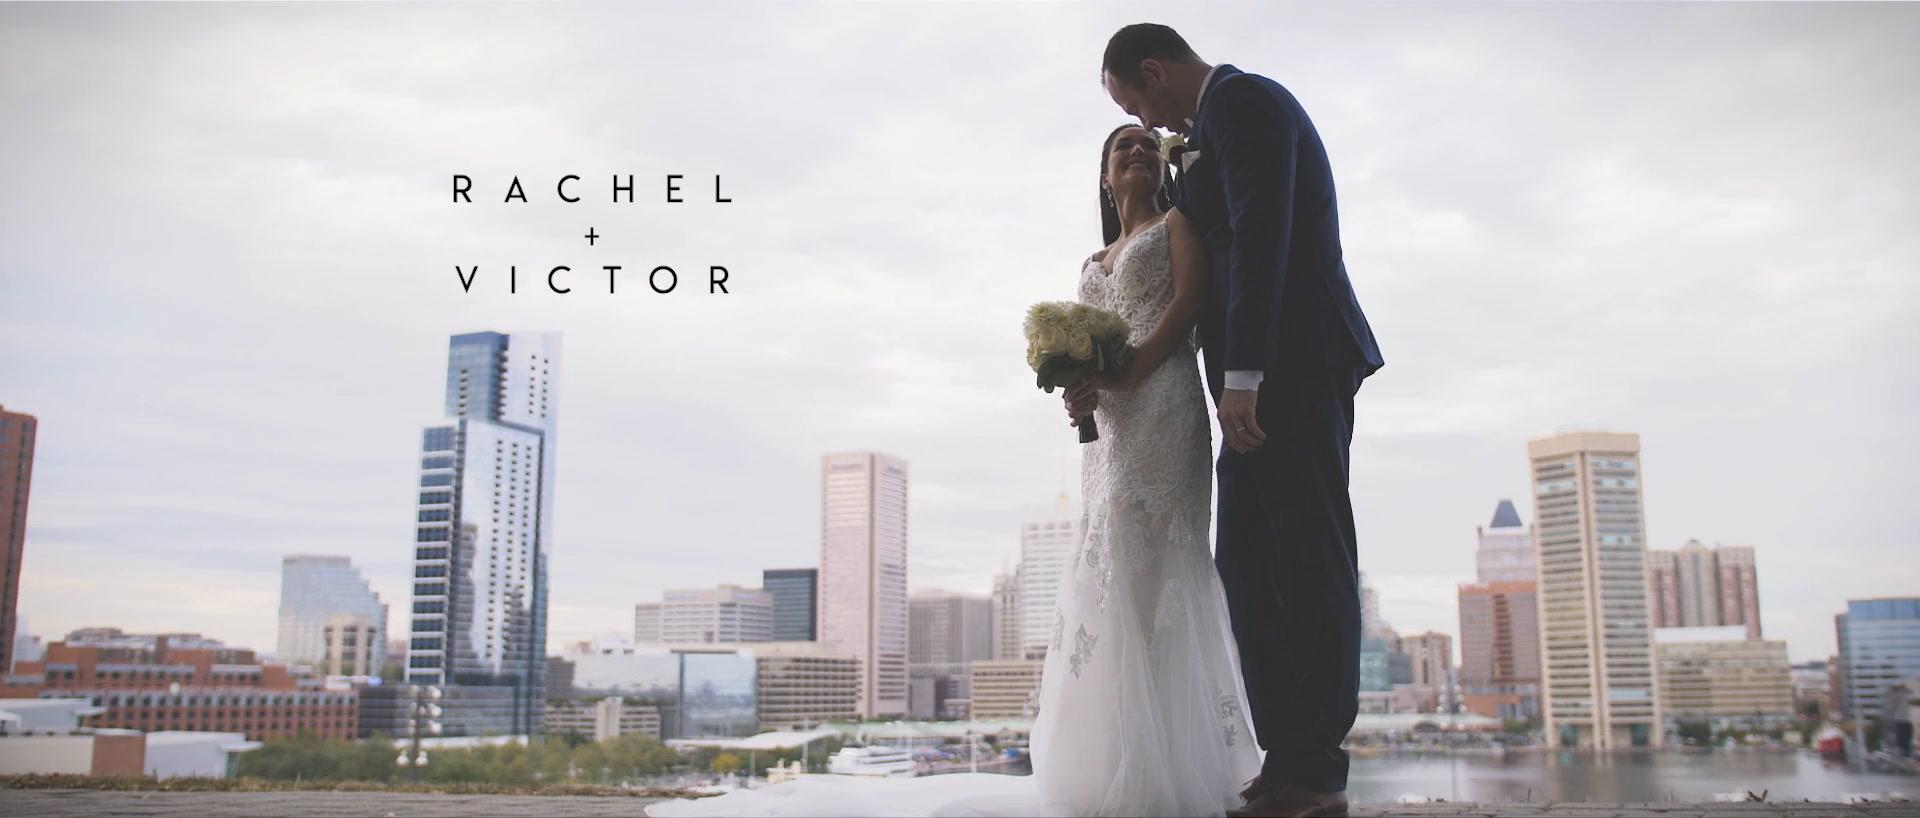 Rachel + Viktor | Baltimore, Maryland | American Visionary Arts Museum